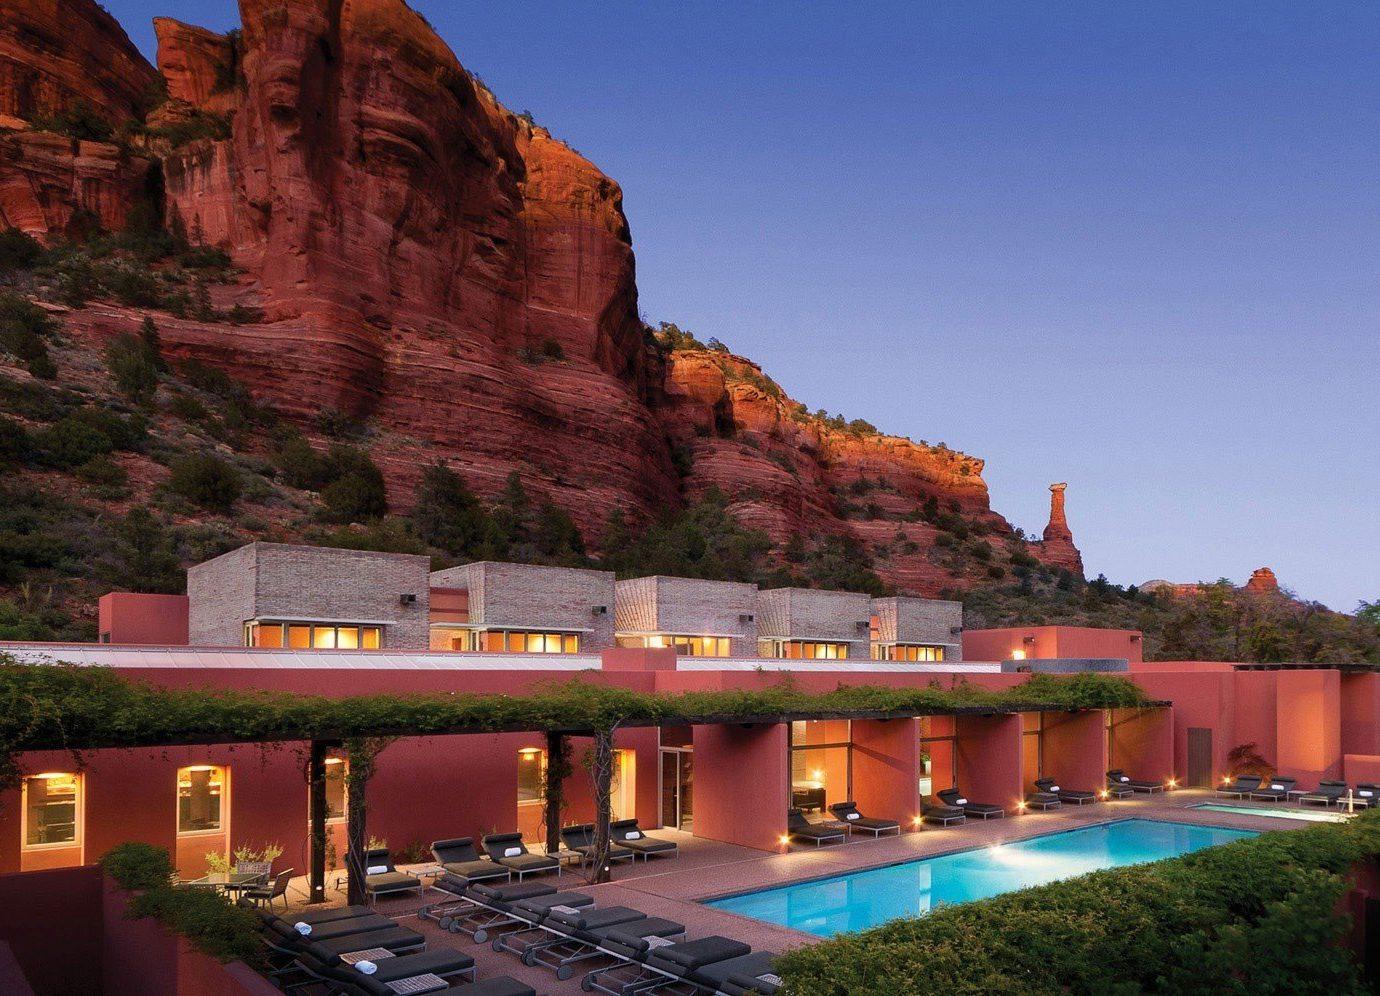 Trip Ideas outdoor landmark mountain Architecture tourism estate Resort traveling long passing